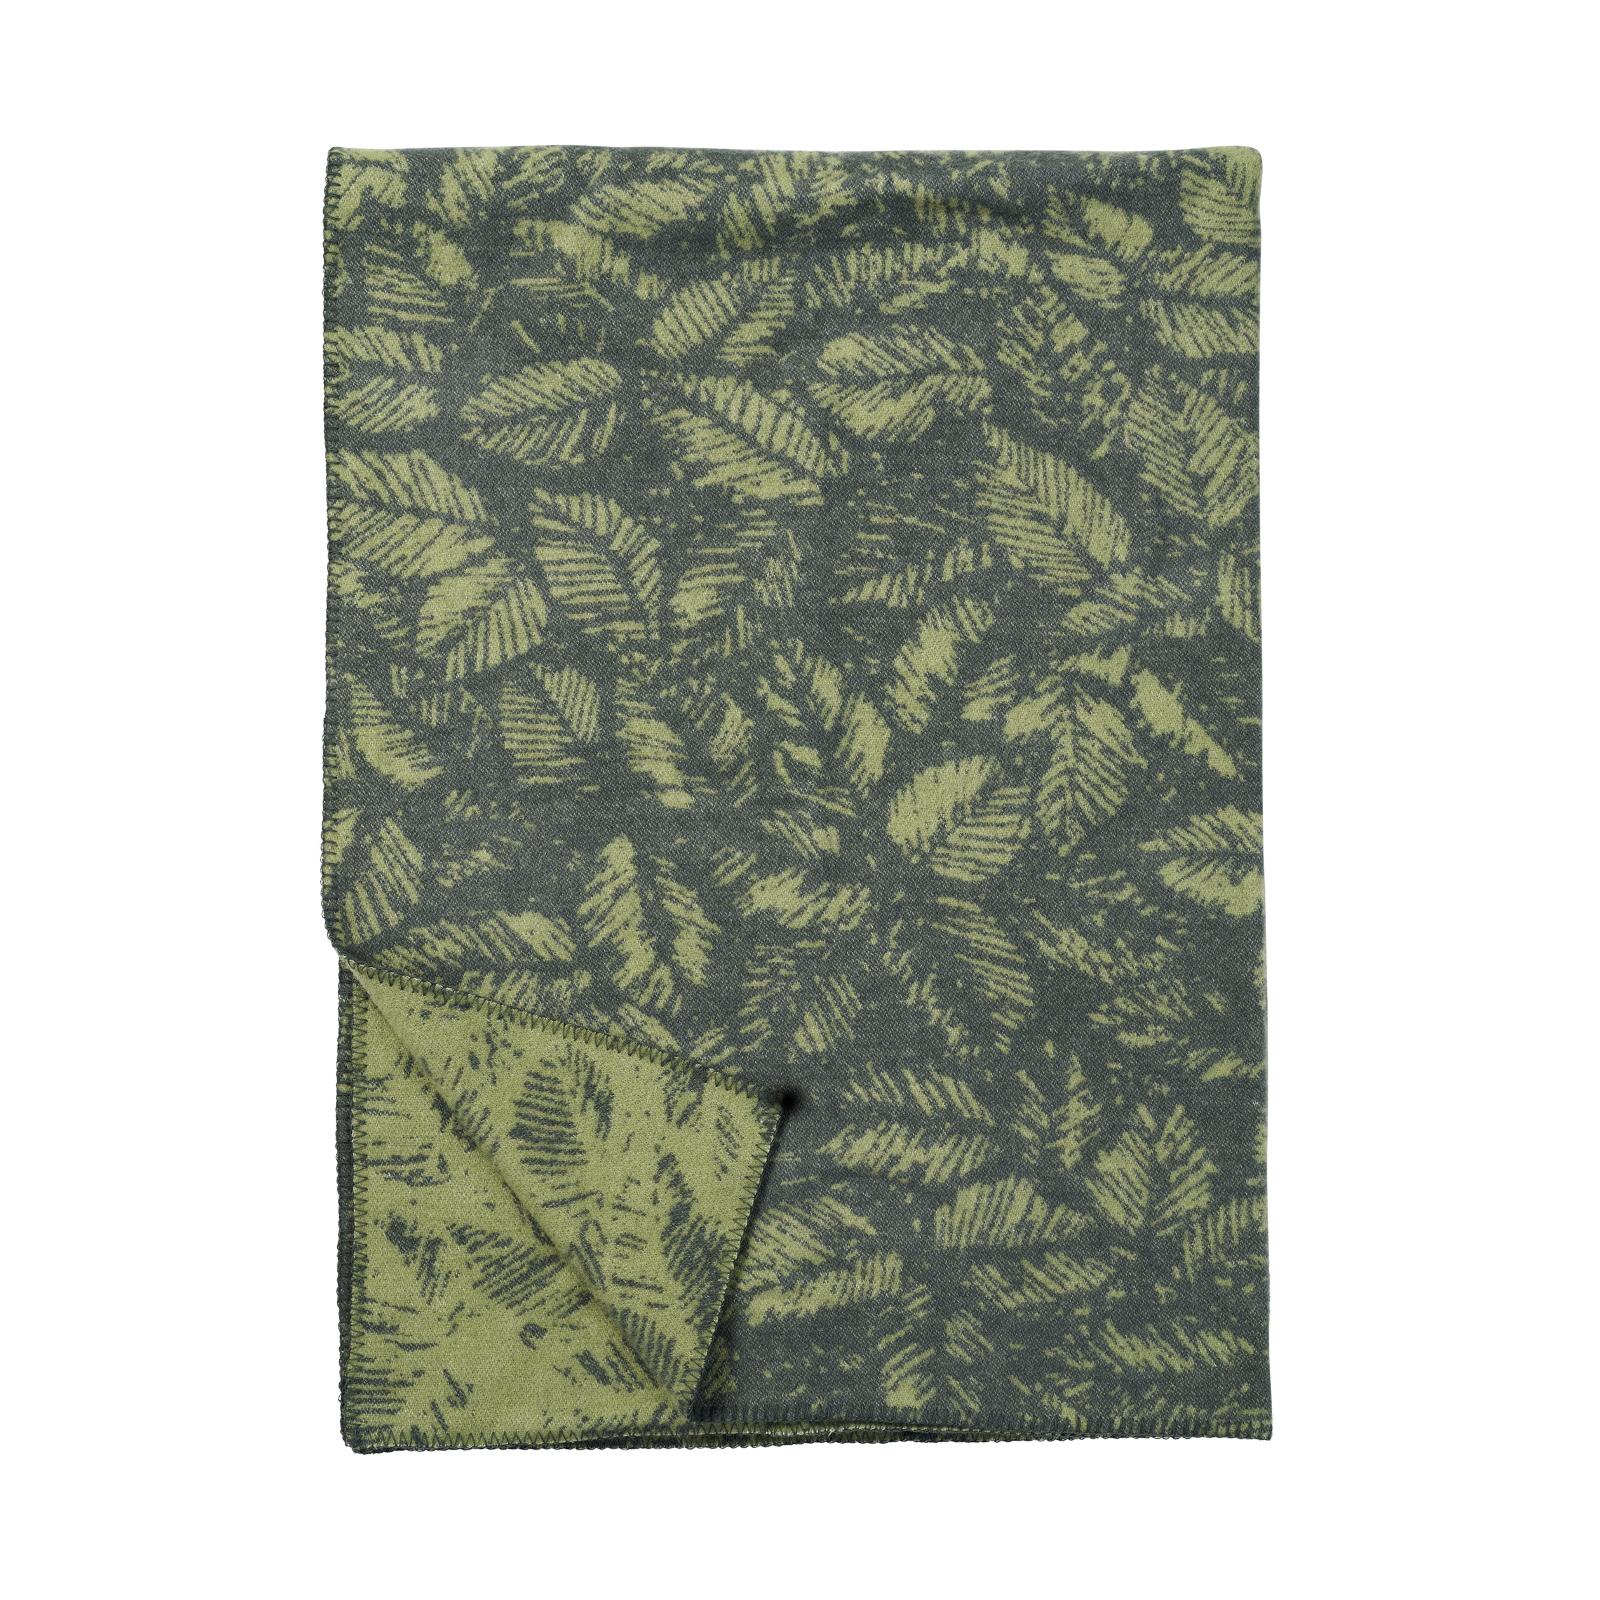 AMORINA ullfilt premium grön, Klippan Yllefabrik